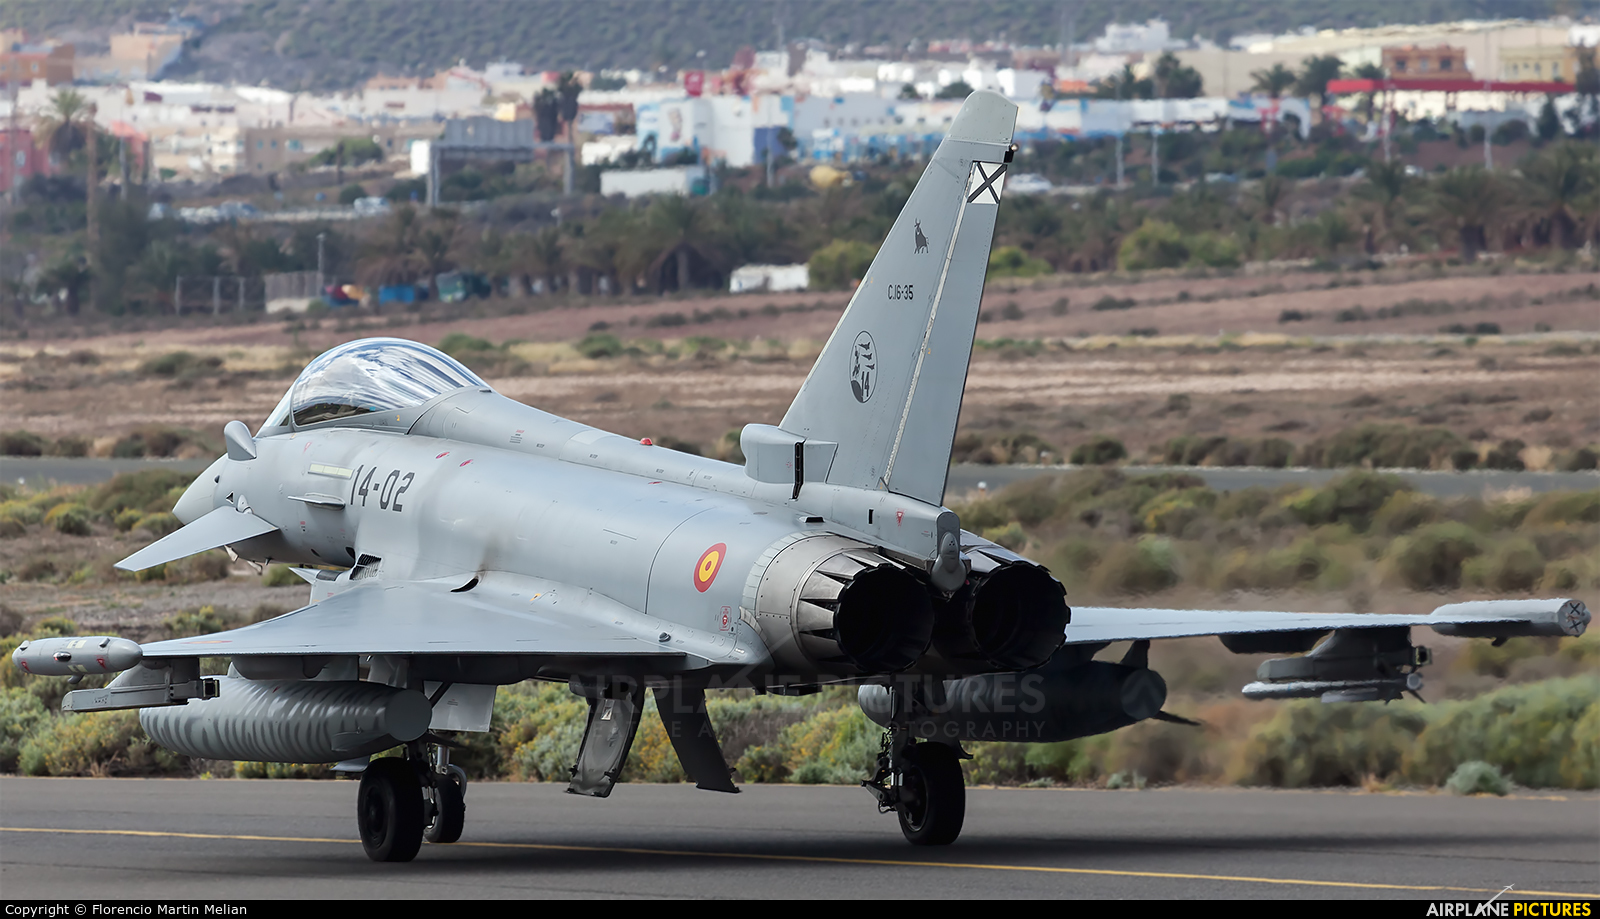 Spain - Air Force C.16-35 aircraft at Aeropuerto de Gran Canaria